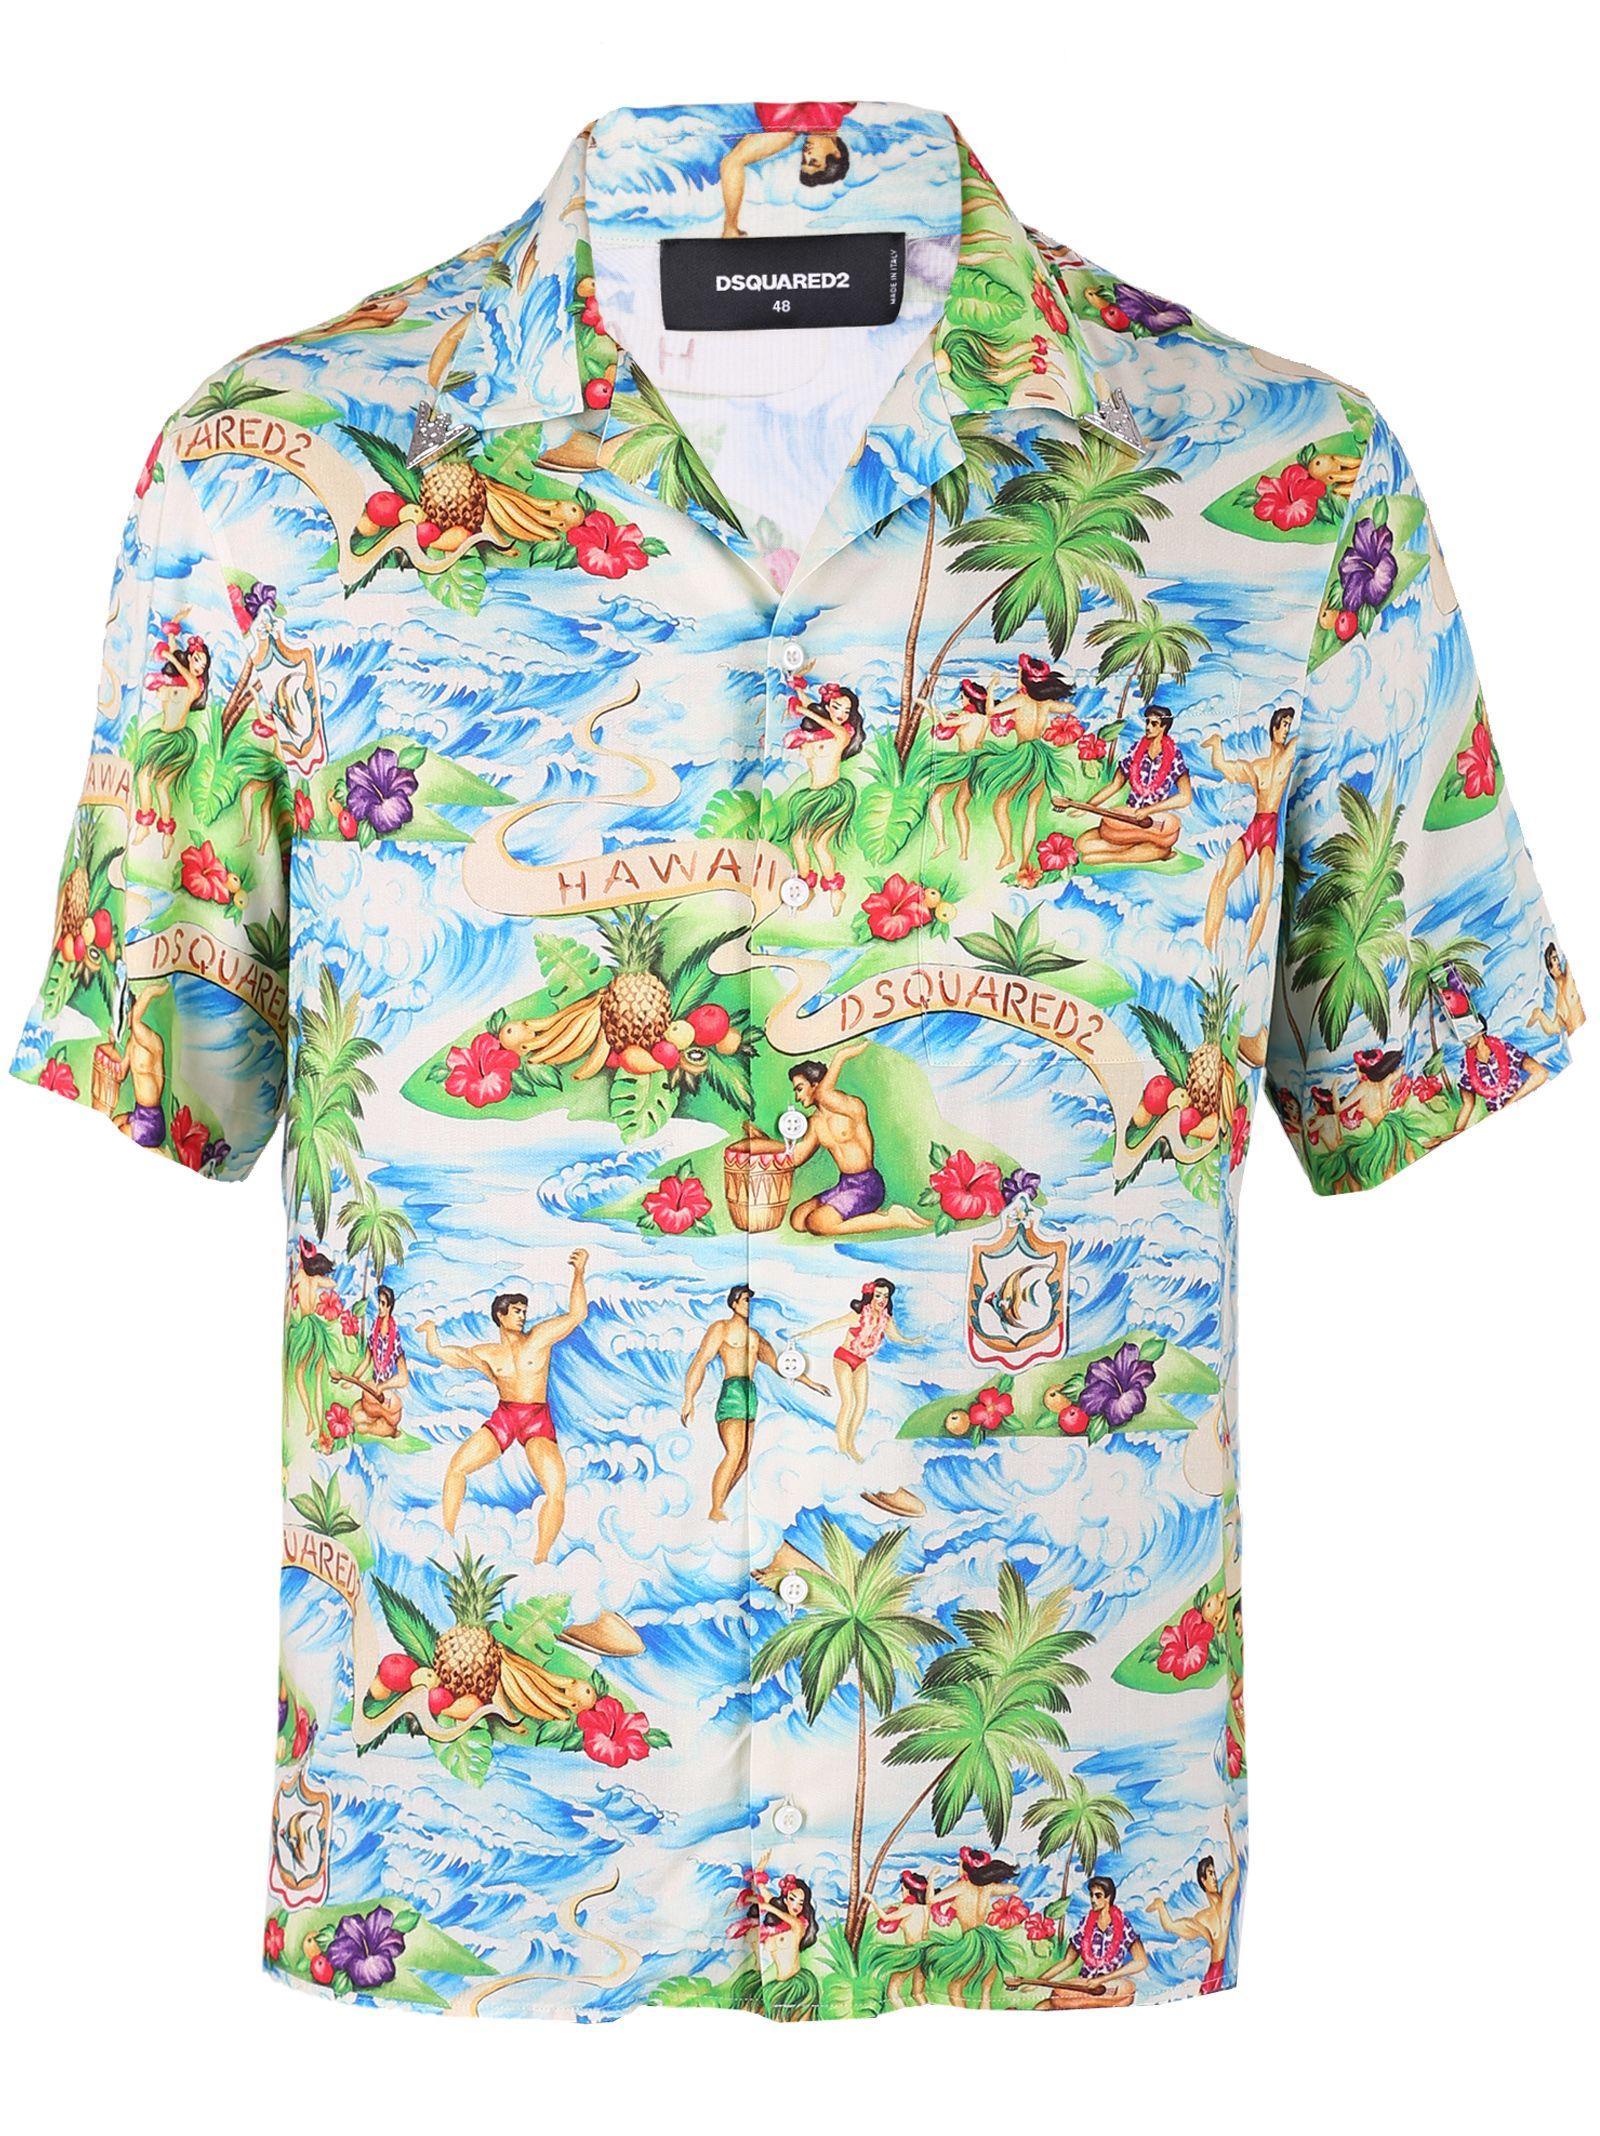 Dsquared2 Printed Viscose Shirt In Multi